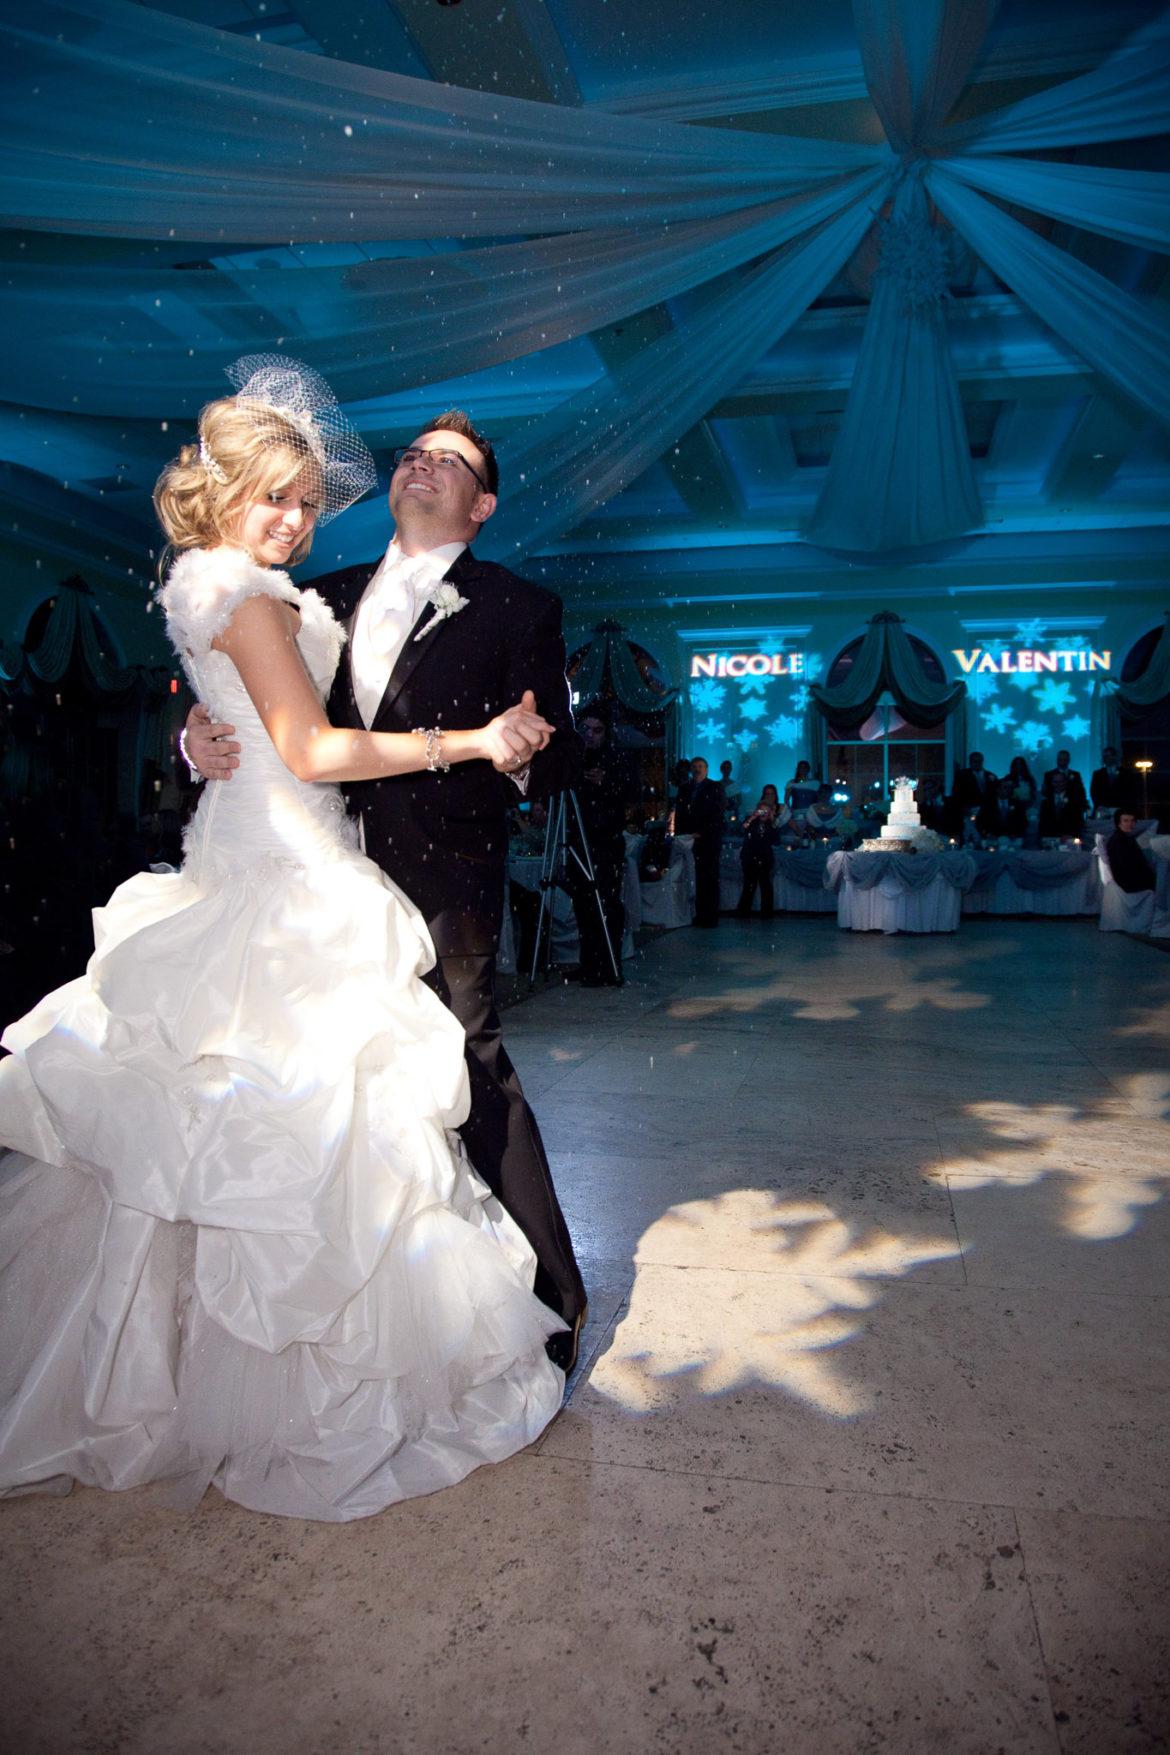 Elegant_Event_Lighting_Chicago_Venutis_Addison_Wedding_Winter_Wonderland_PAttern_LightingCeiling_Drape